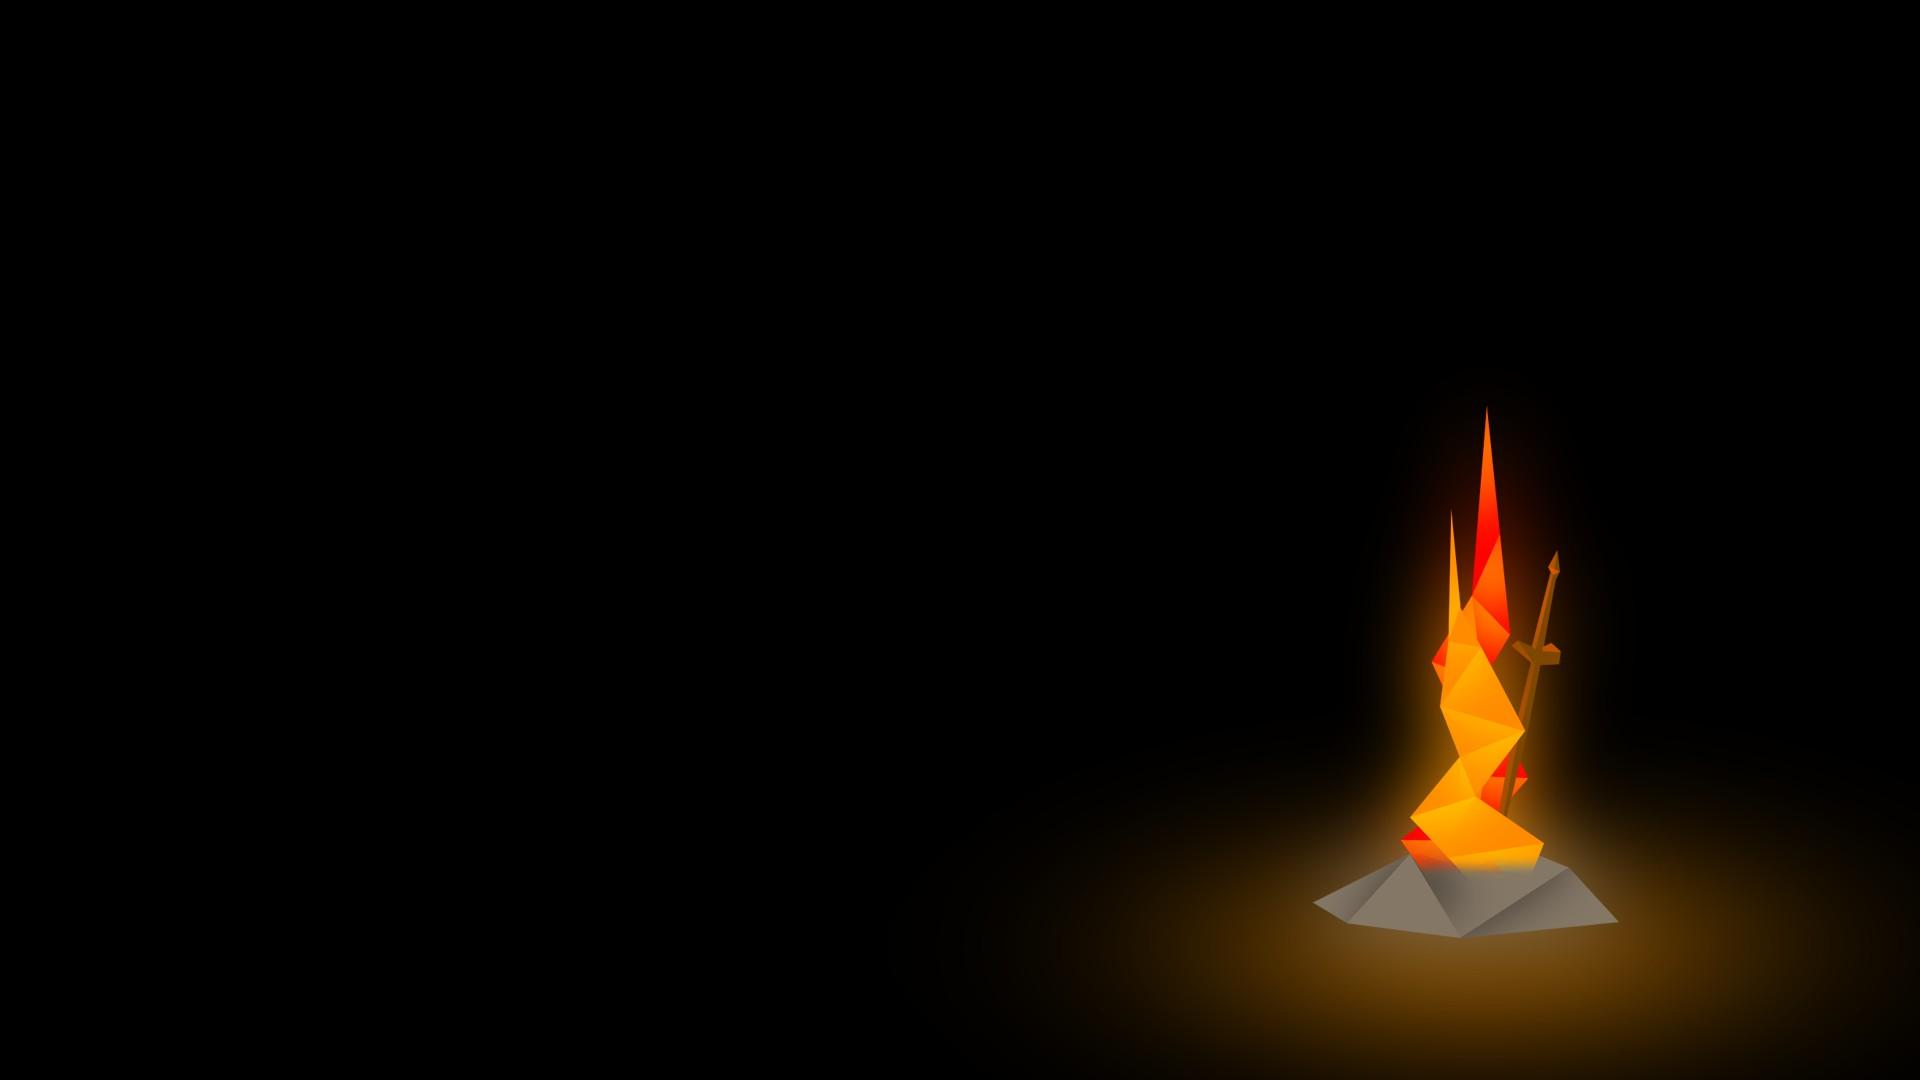 Free Download Dark Souls Bonfire Wallpaper Download Amazing High